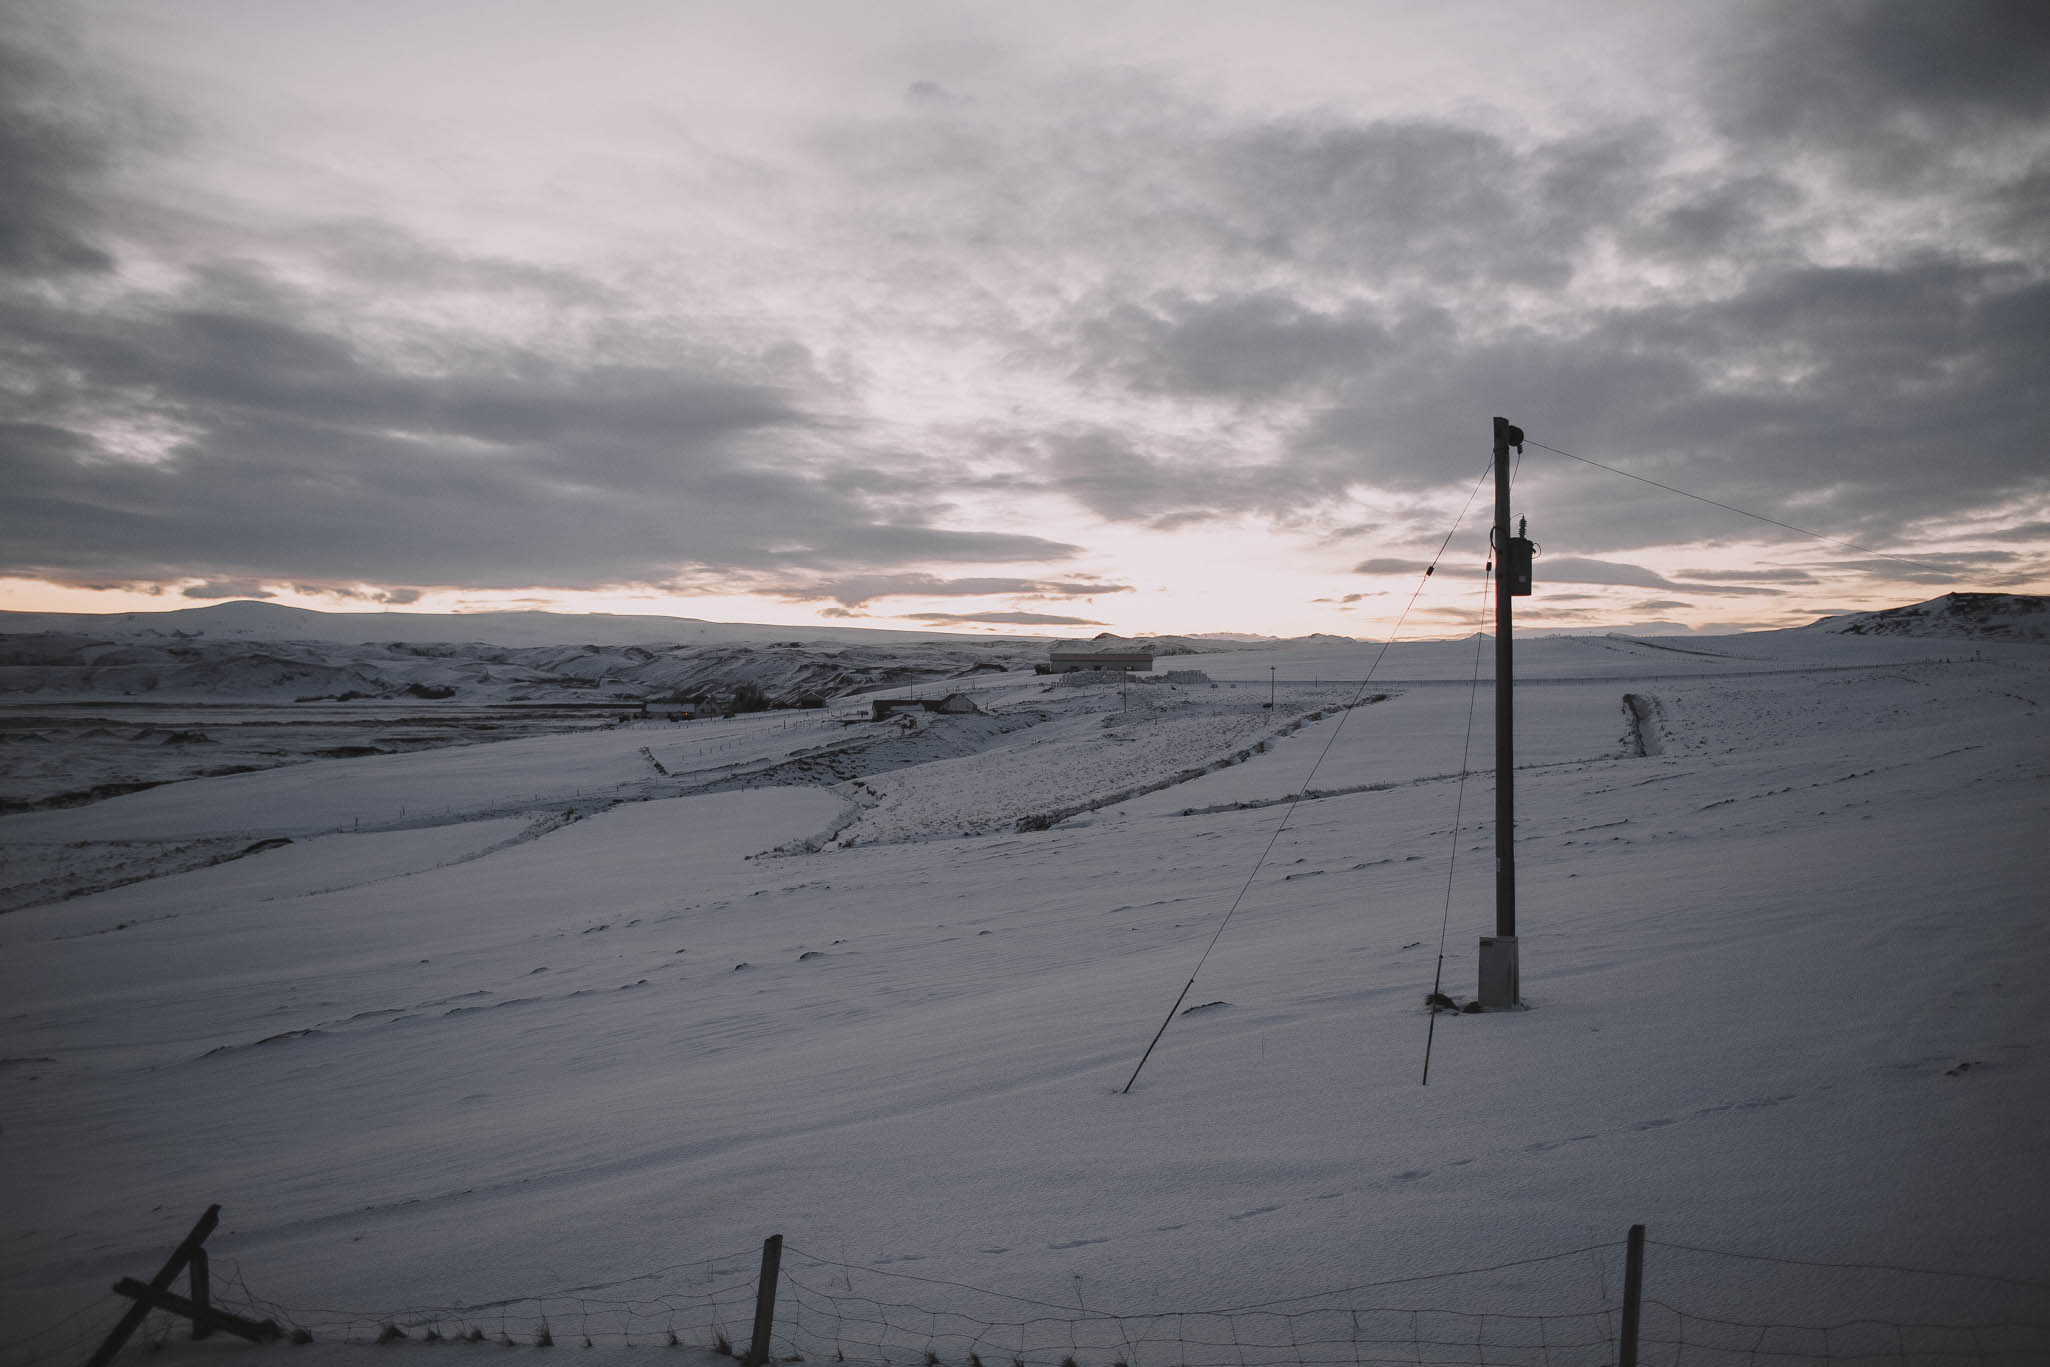 Road-trip-Islande-Iceland-Voyage-Travel-Portrait-Jérémy-Boyer-Skaftafell-6.jpg